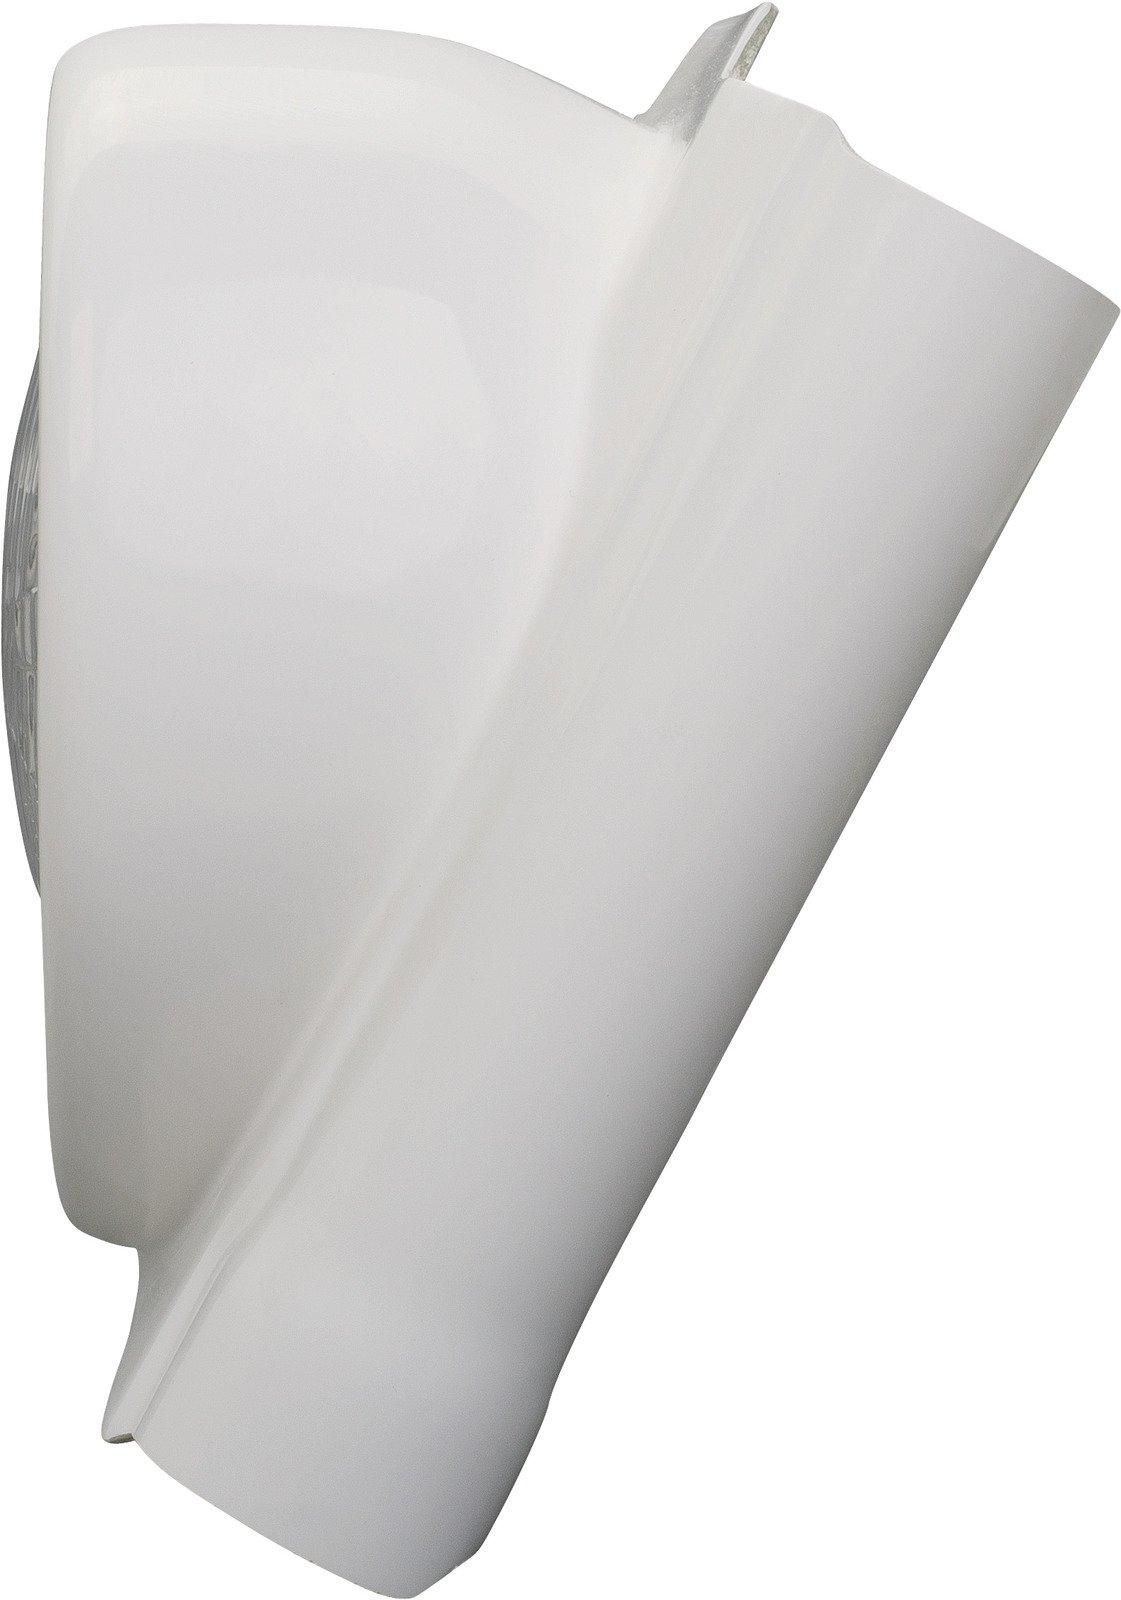 JvB-Moto Universal Motorcycle Models H4 Head Light Cover Conversion Kit for Custom Builds JVB0023